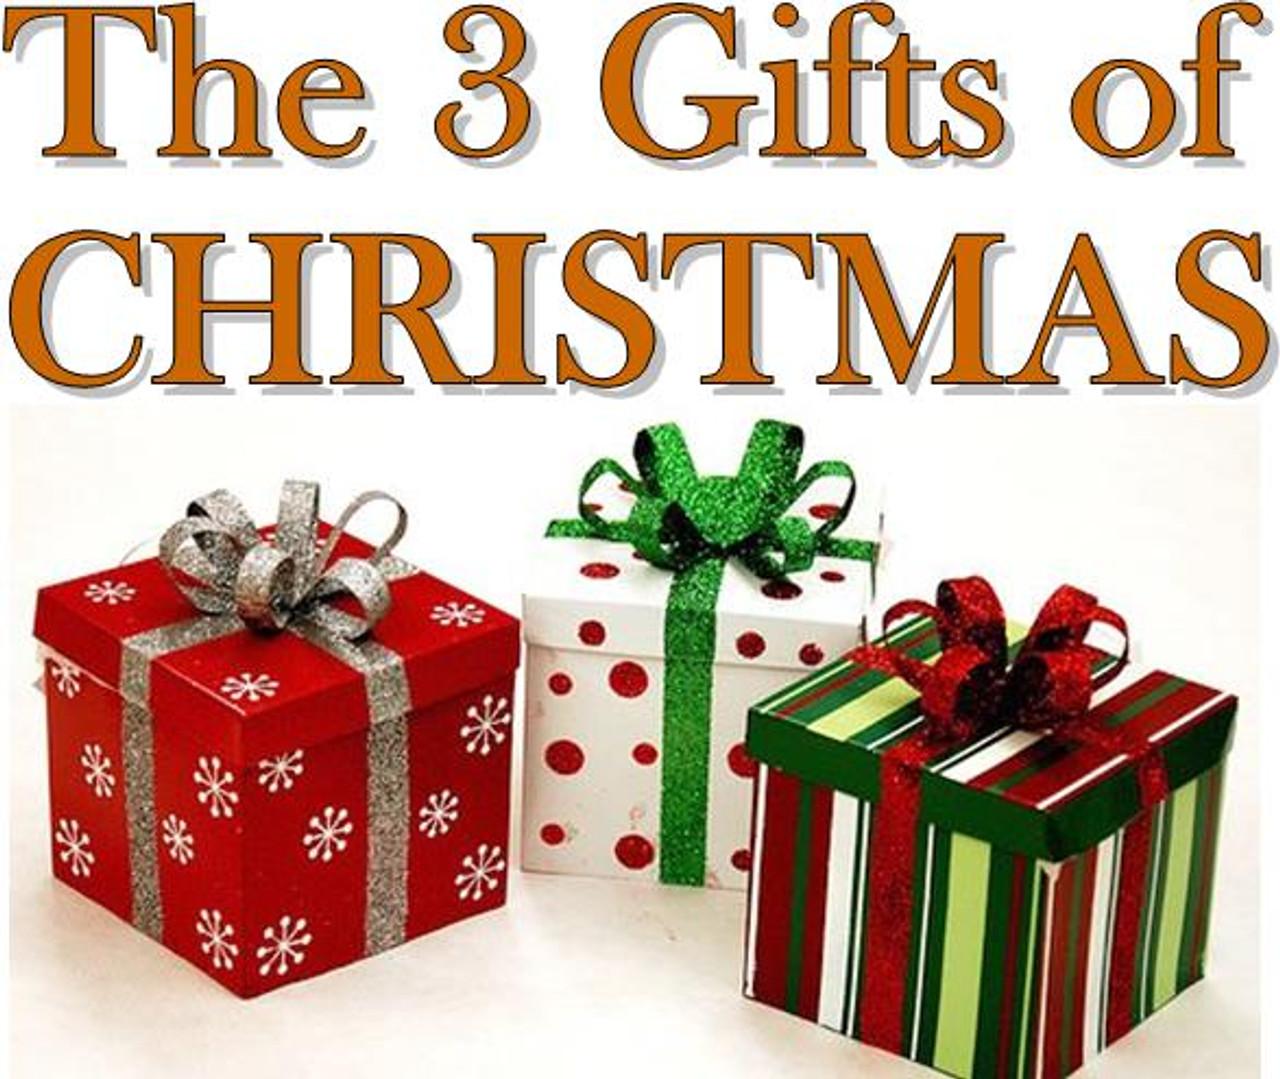 Christmas Gospel Magic Trick